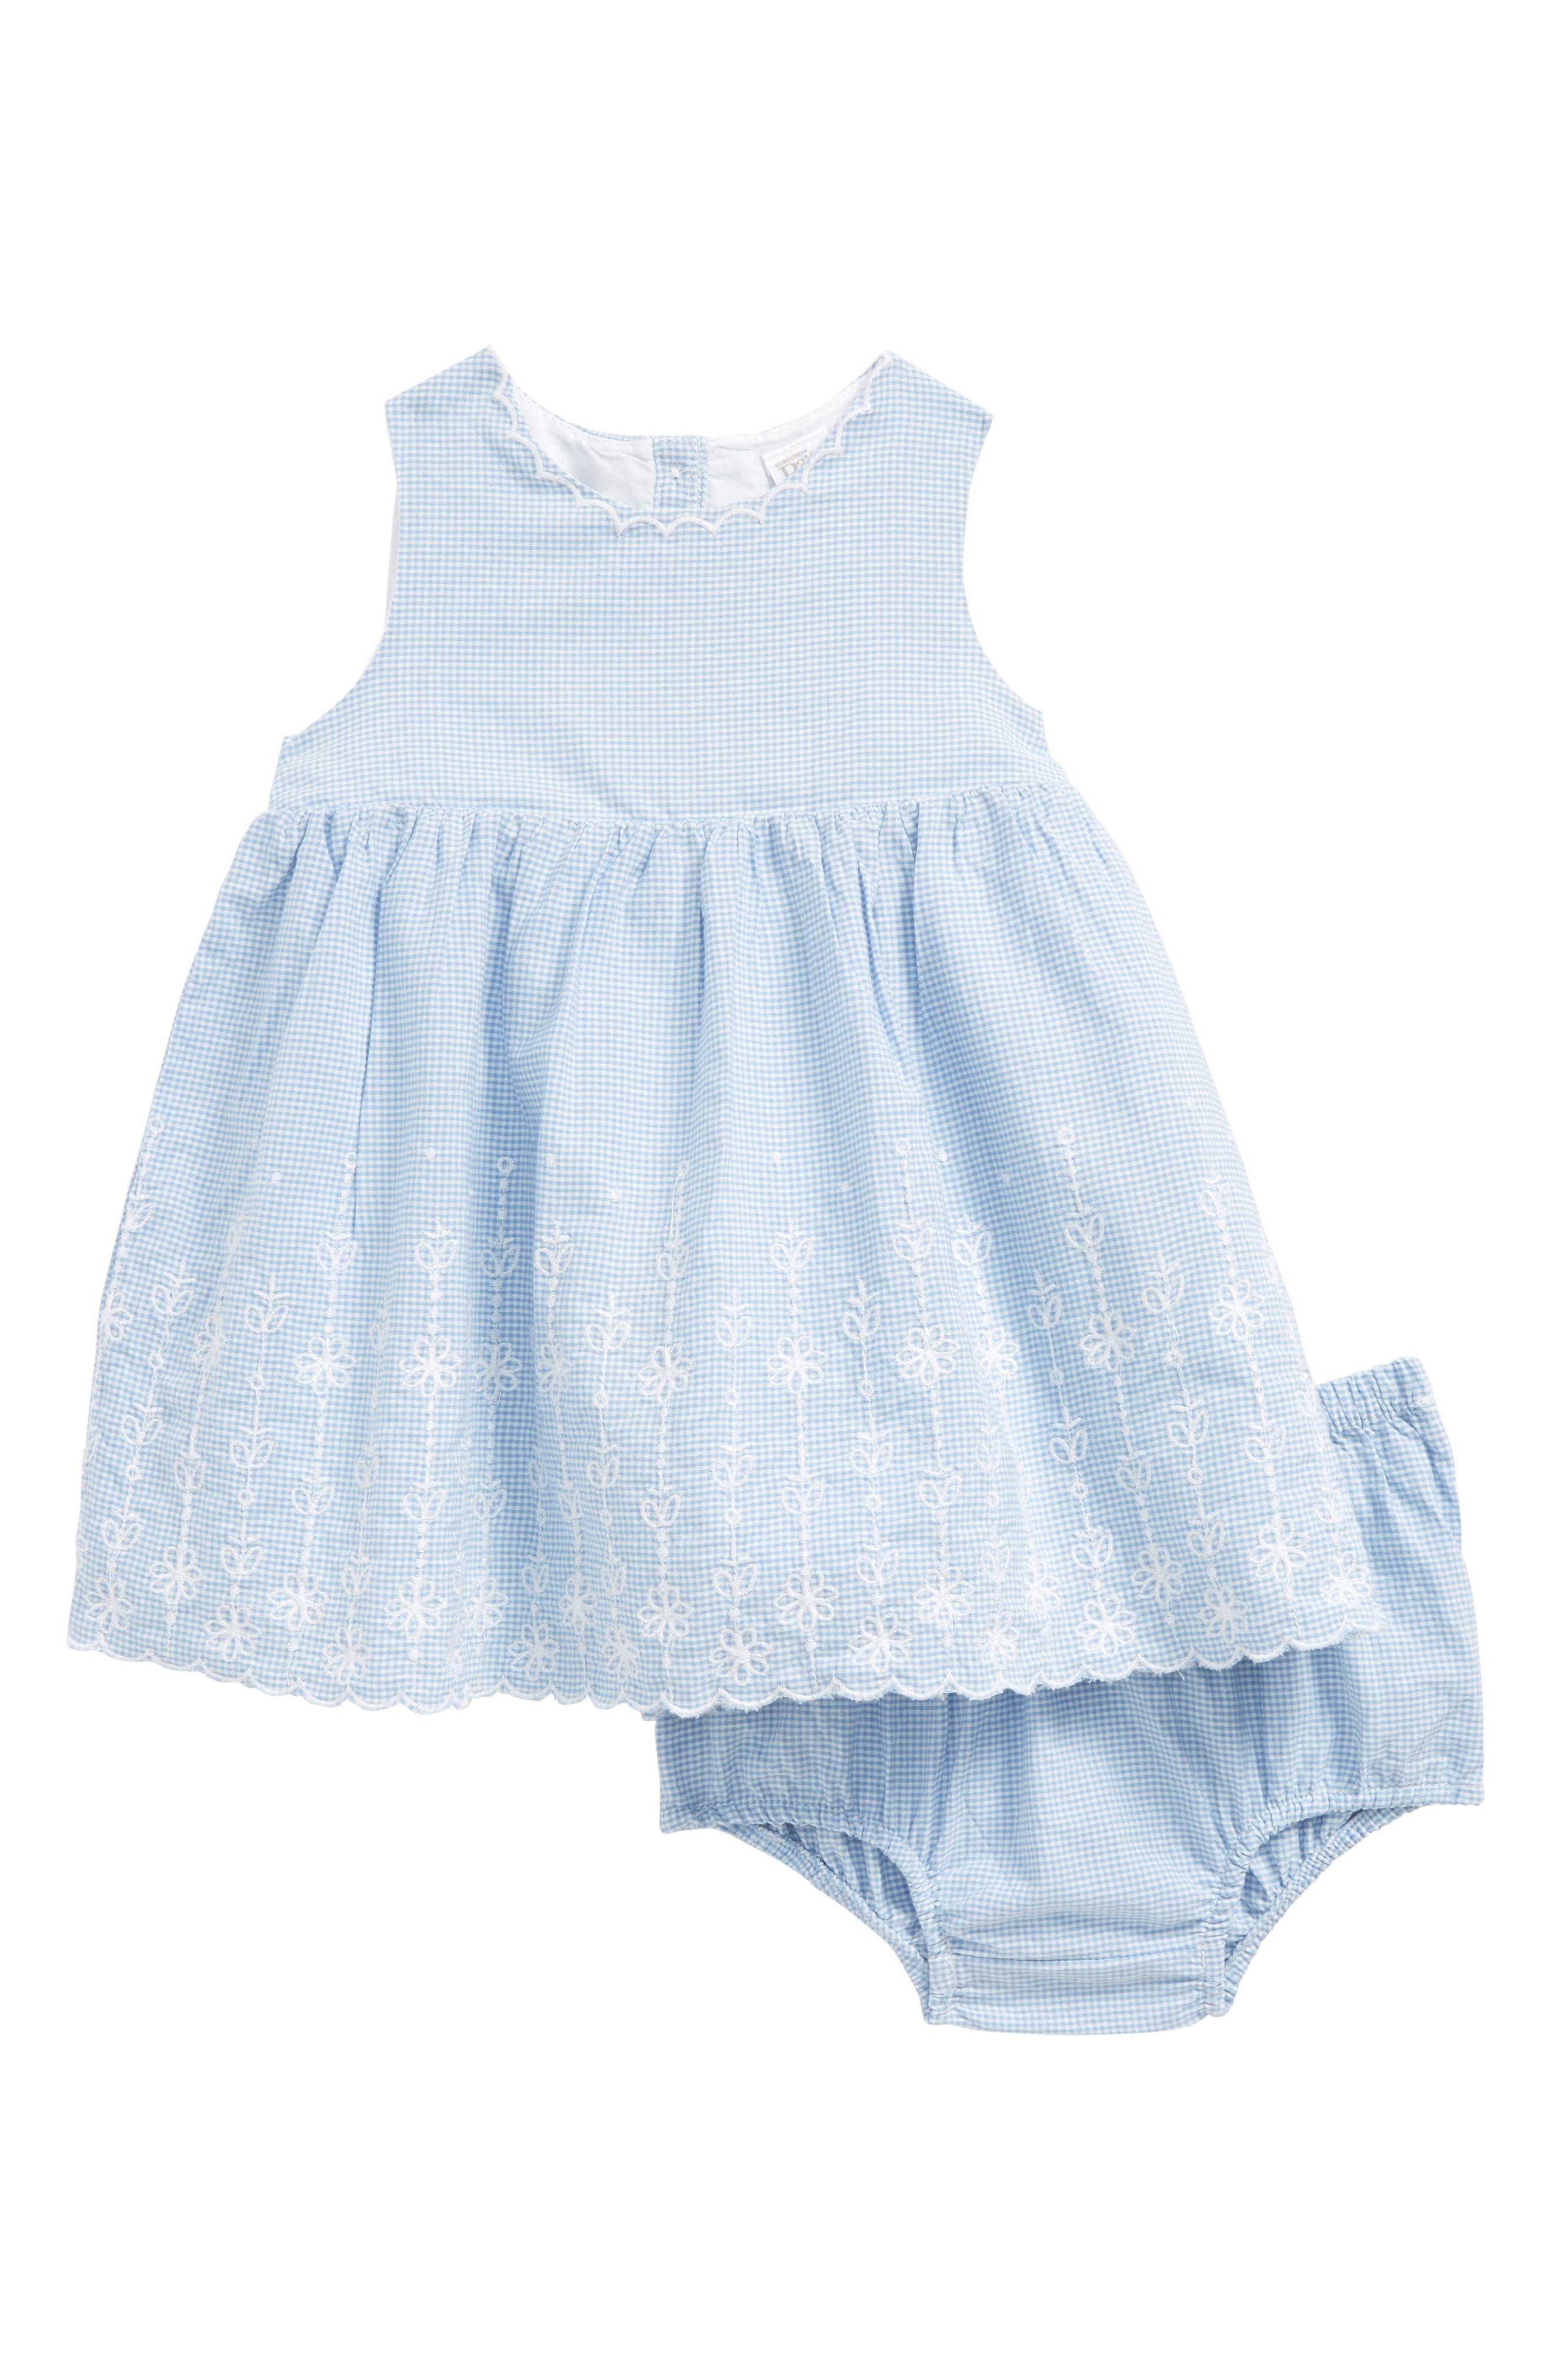 Embroidered Mini Check Dress,                             Main thumbnail 1, color,                             White- Blue Mini Check